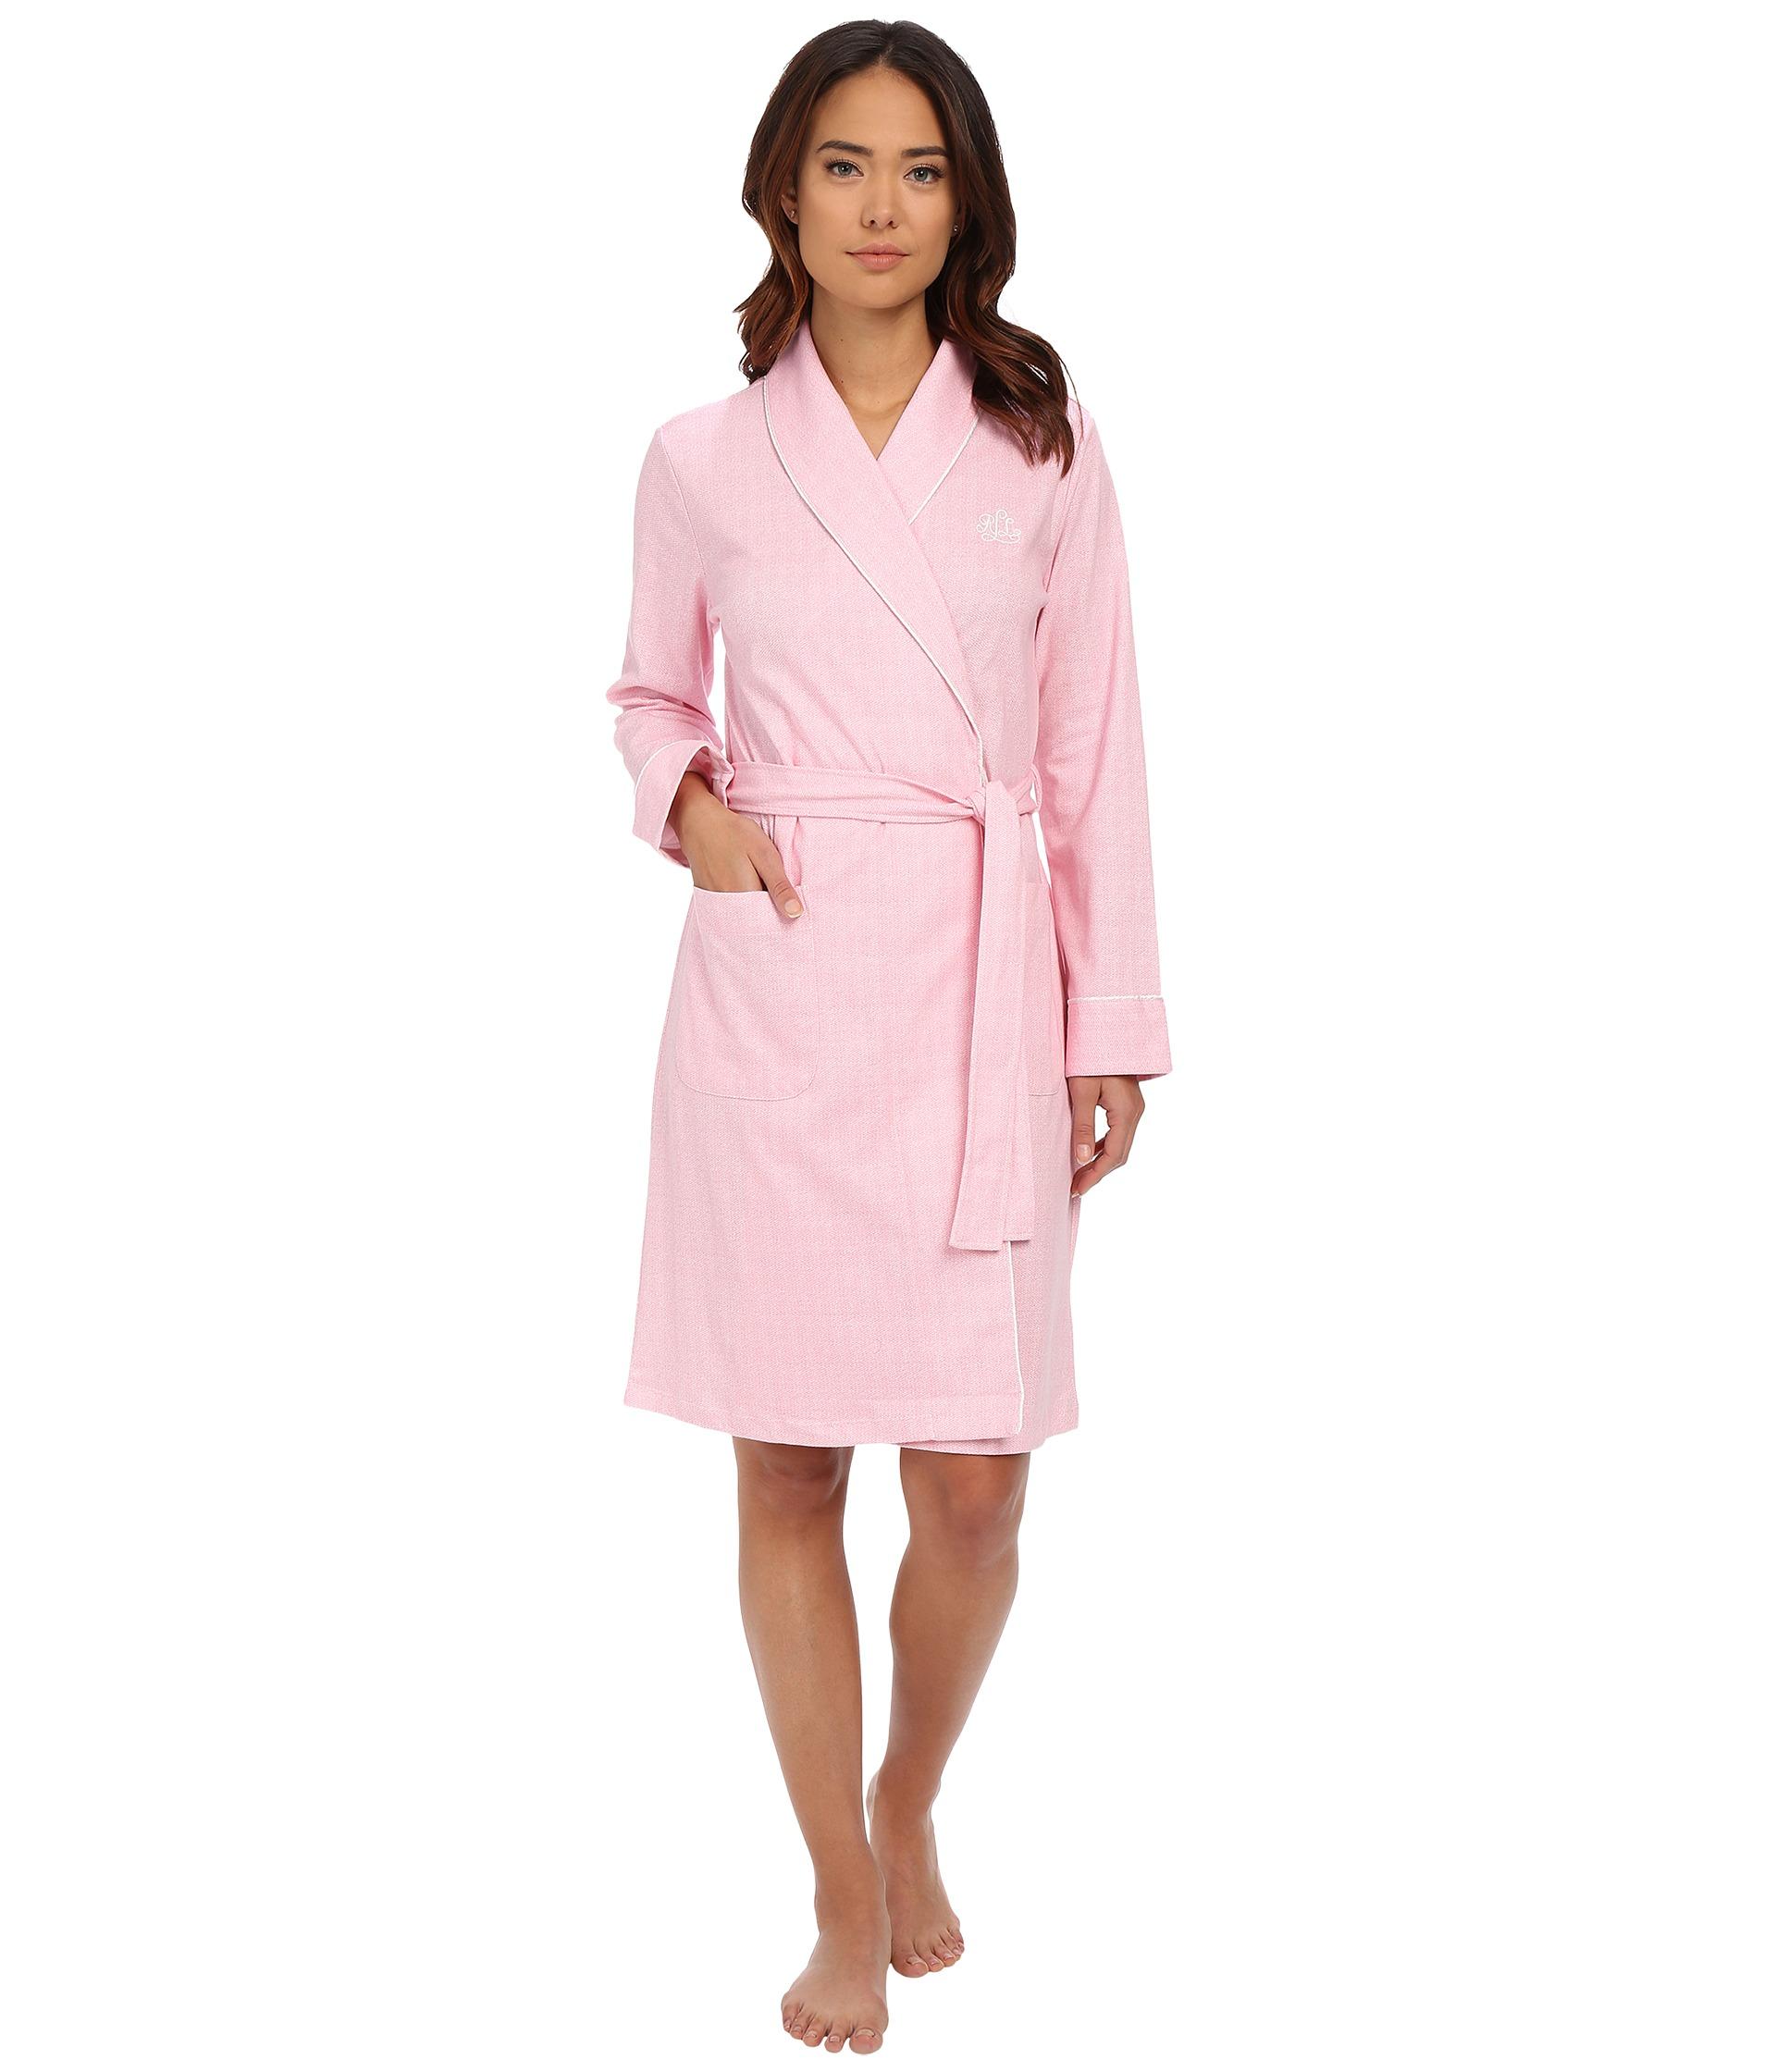 lauren ralph lauren interlock short shawl collar robe free shipping both ways. Black Bedroom Furniture Sets. Home Design Ideas